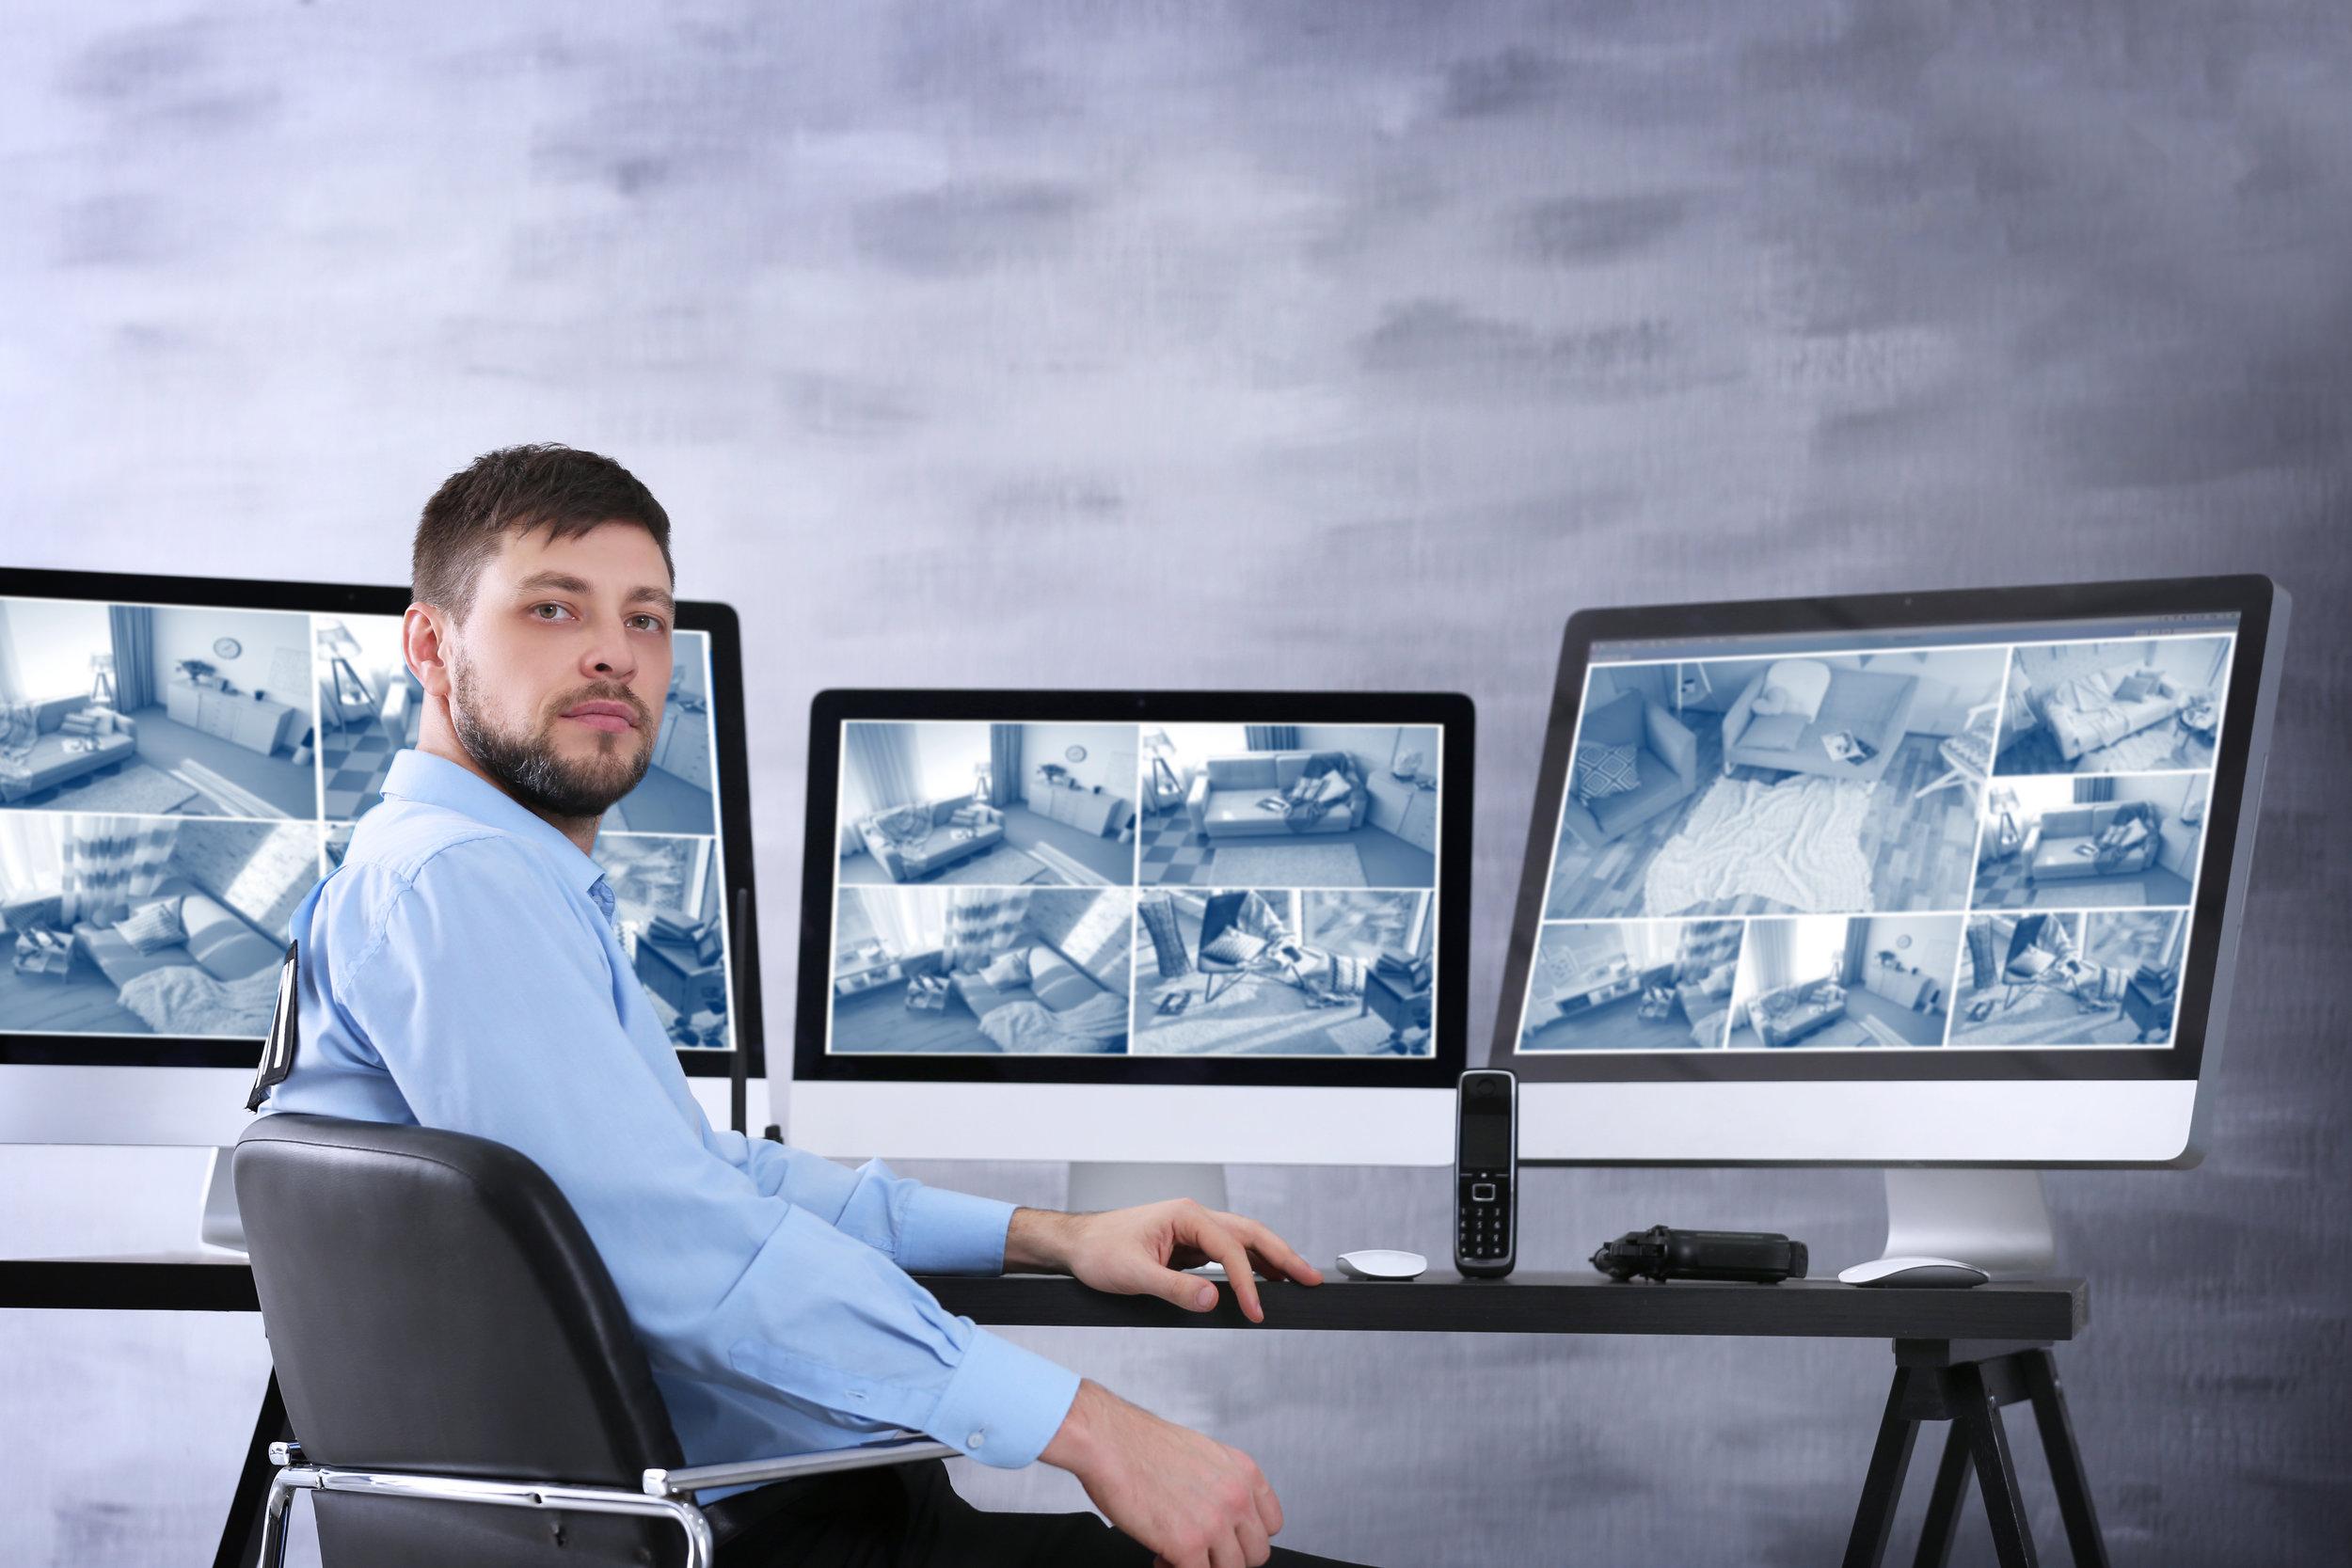 Live Remote Video Surveillance Monitoring - Prevent Crime Before It Happens!